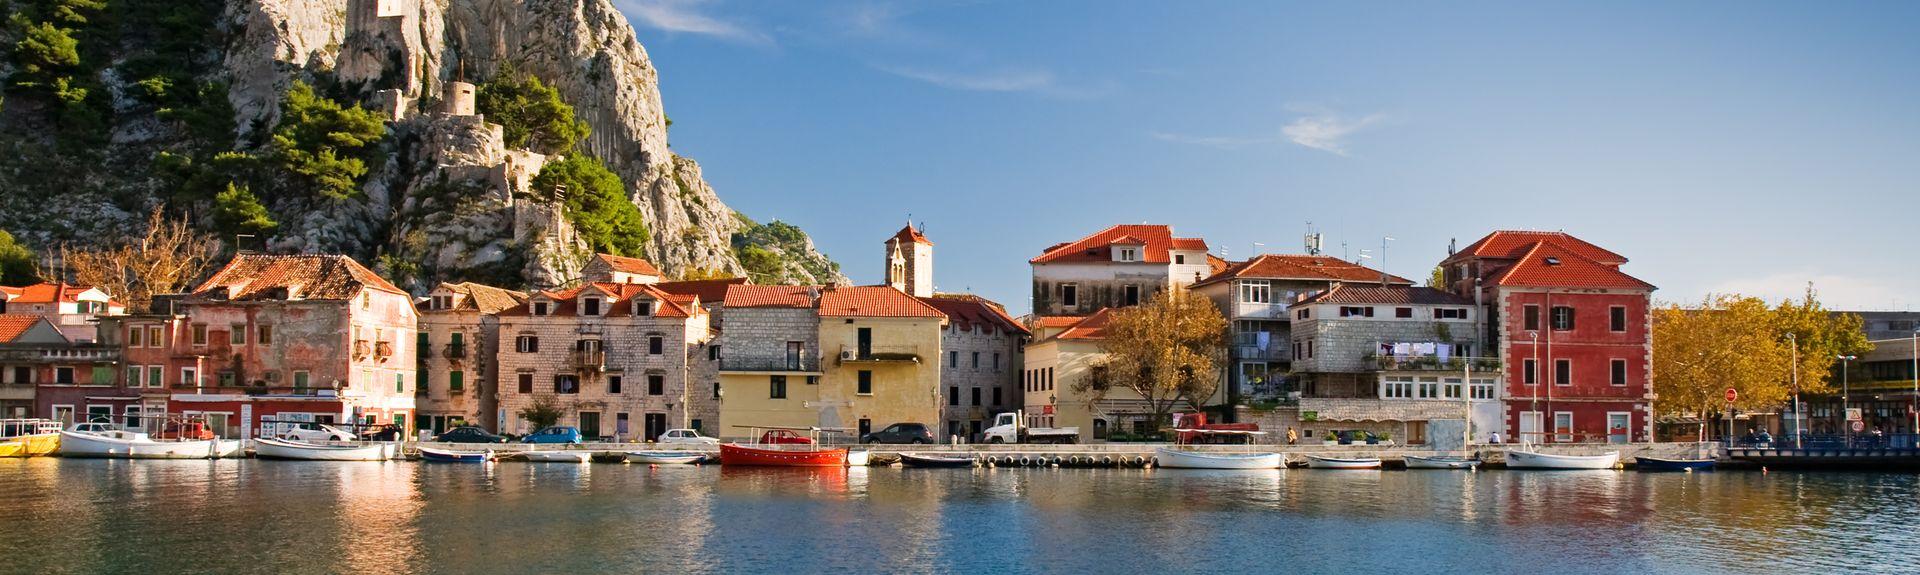 Omiš, Split-Dalmatia County, Croatia